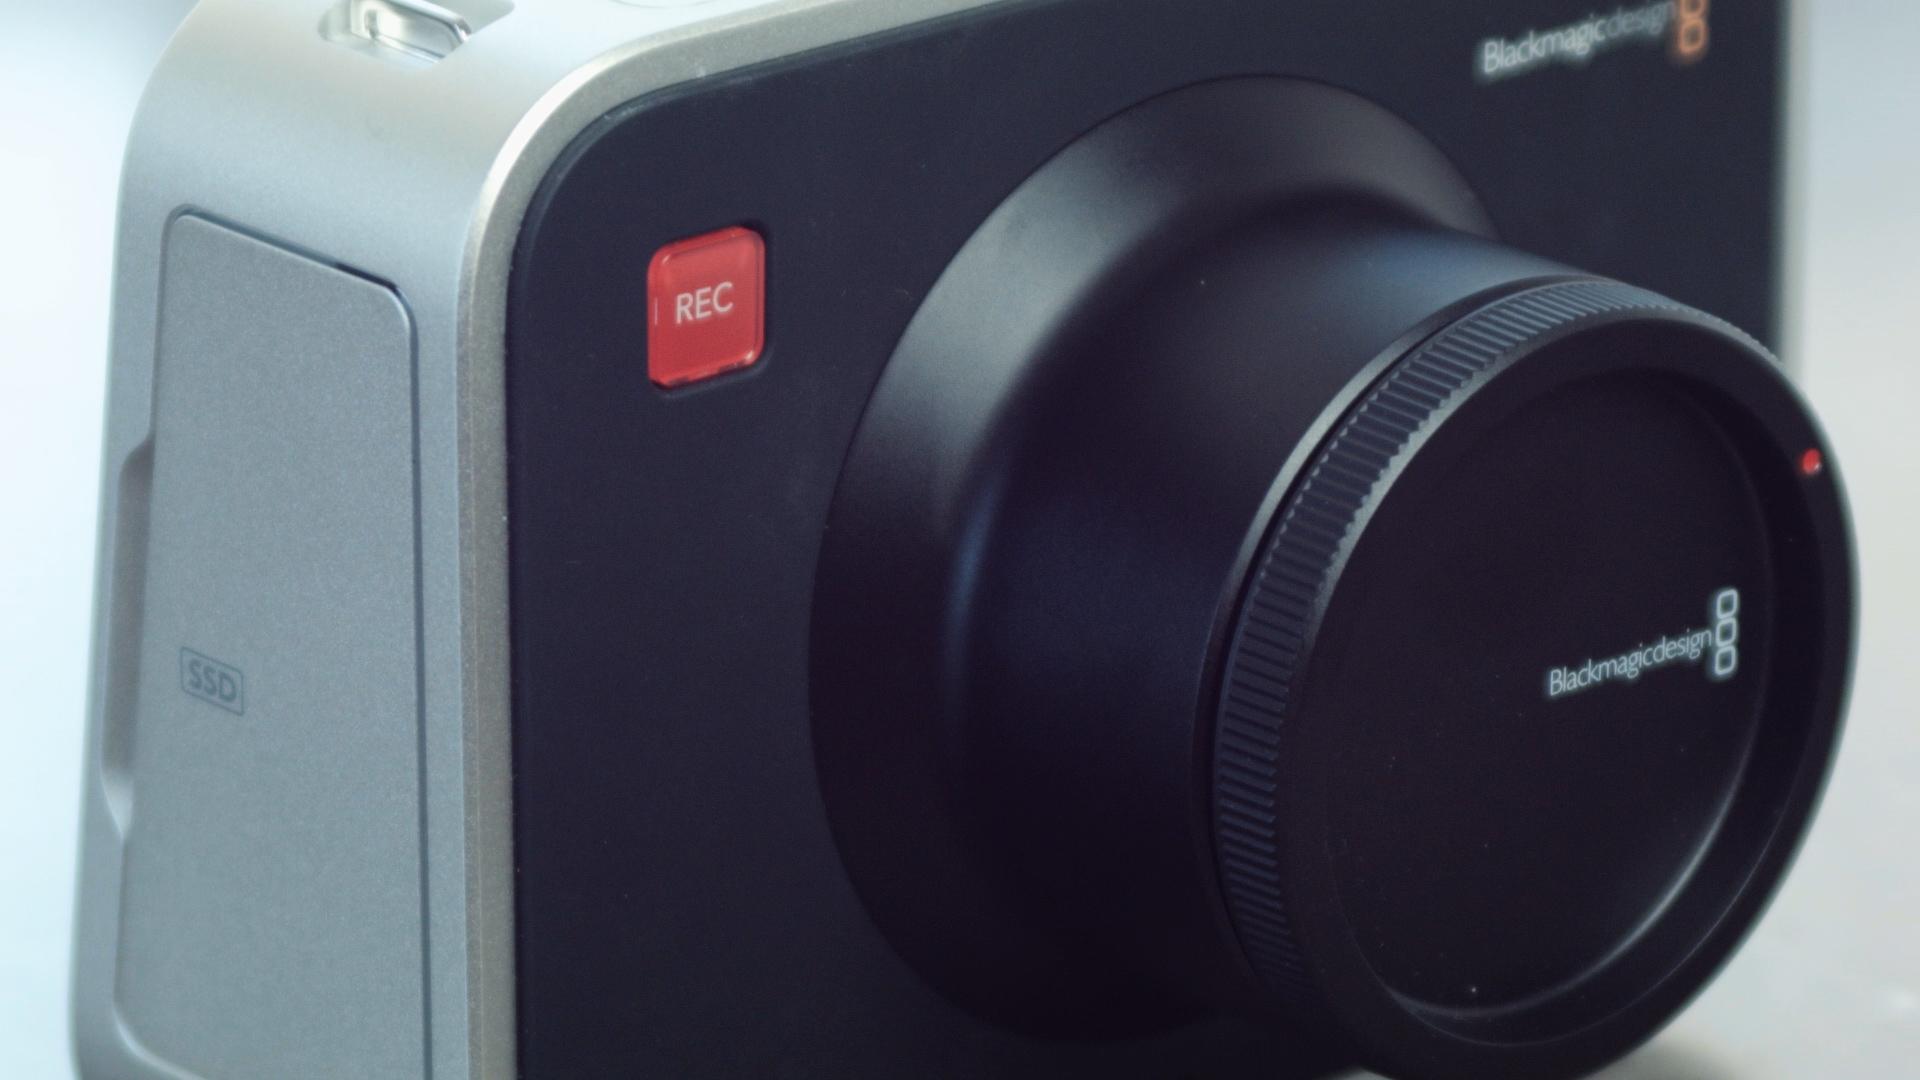 5 Reasons To Buy A Blackmagic 25K Cinema Camera